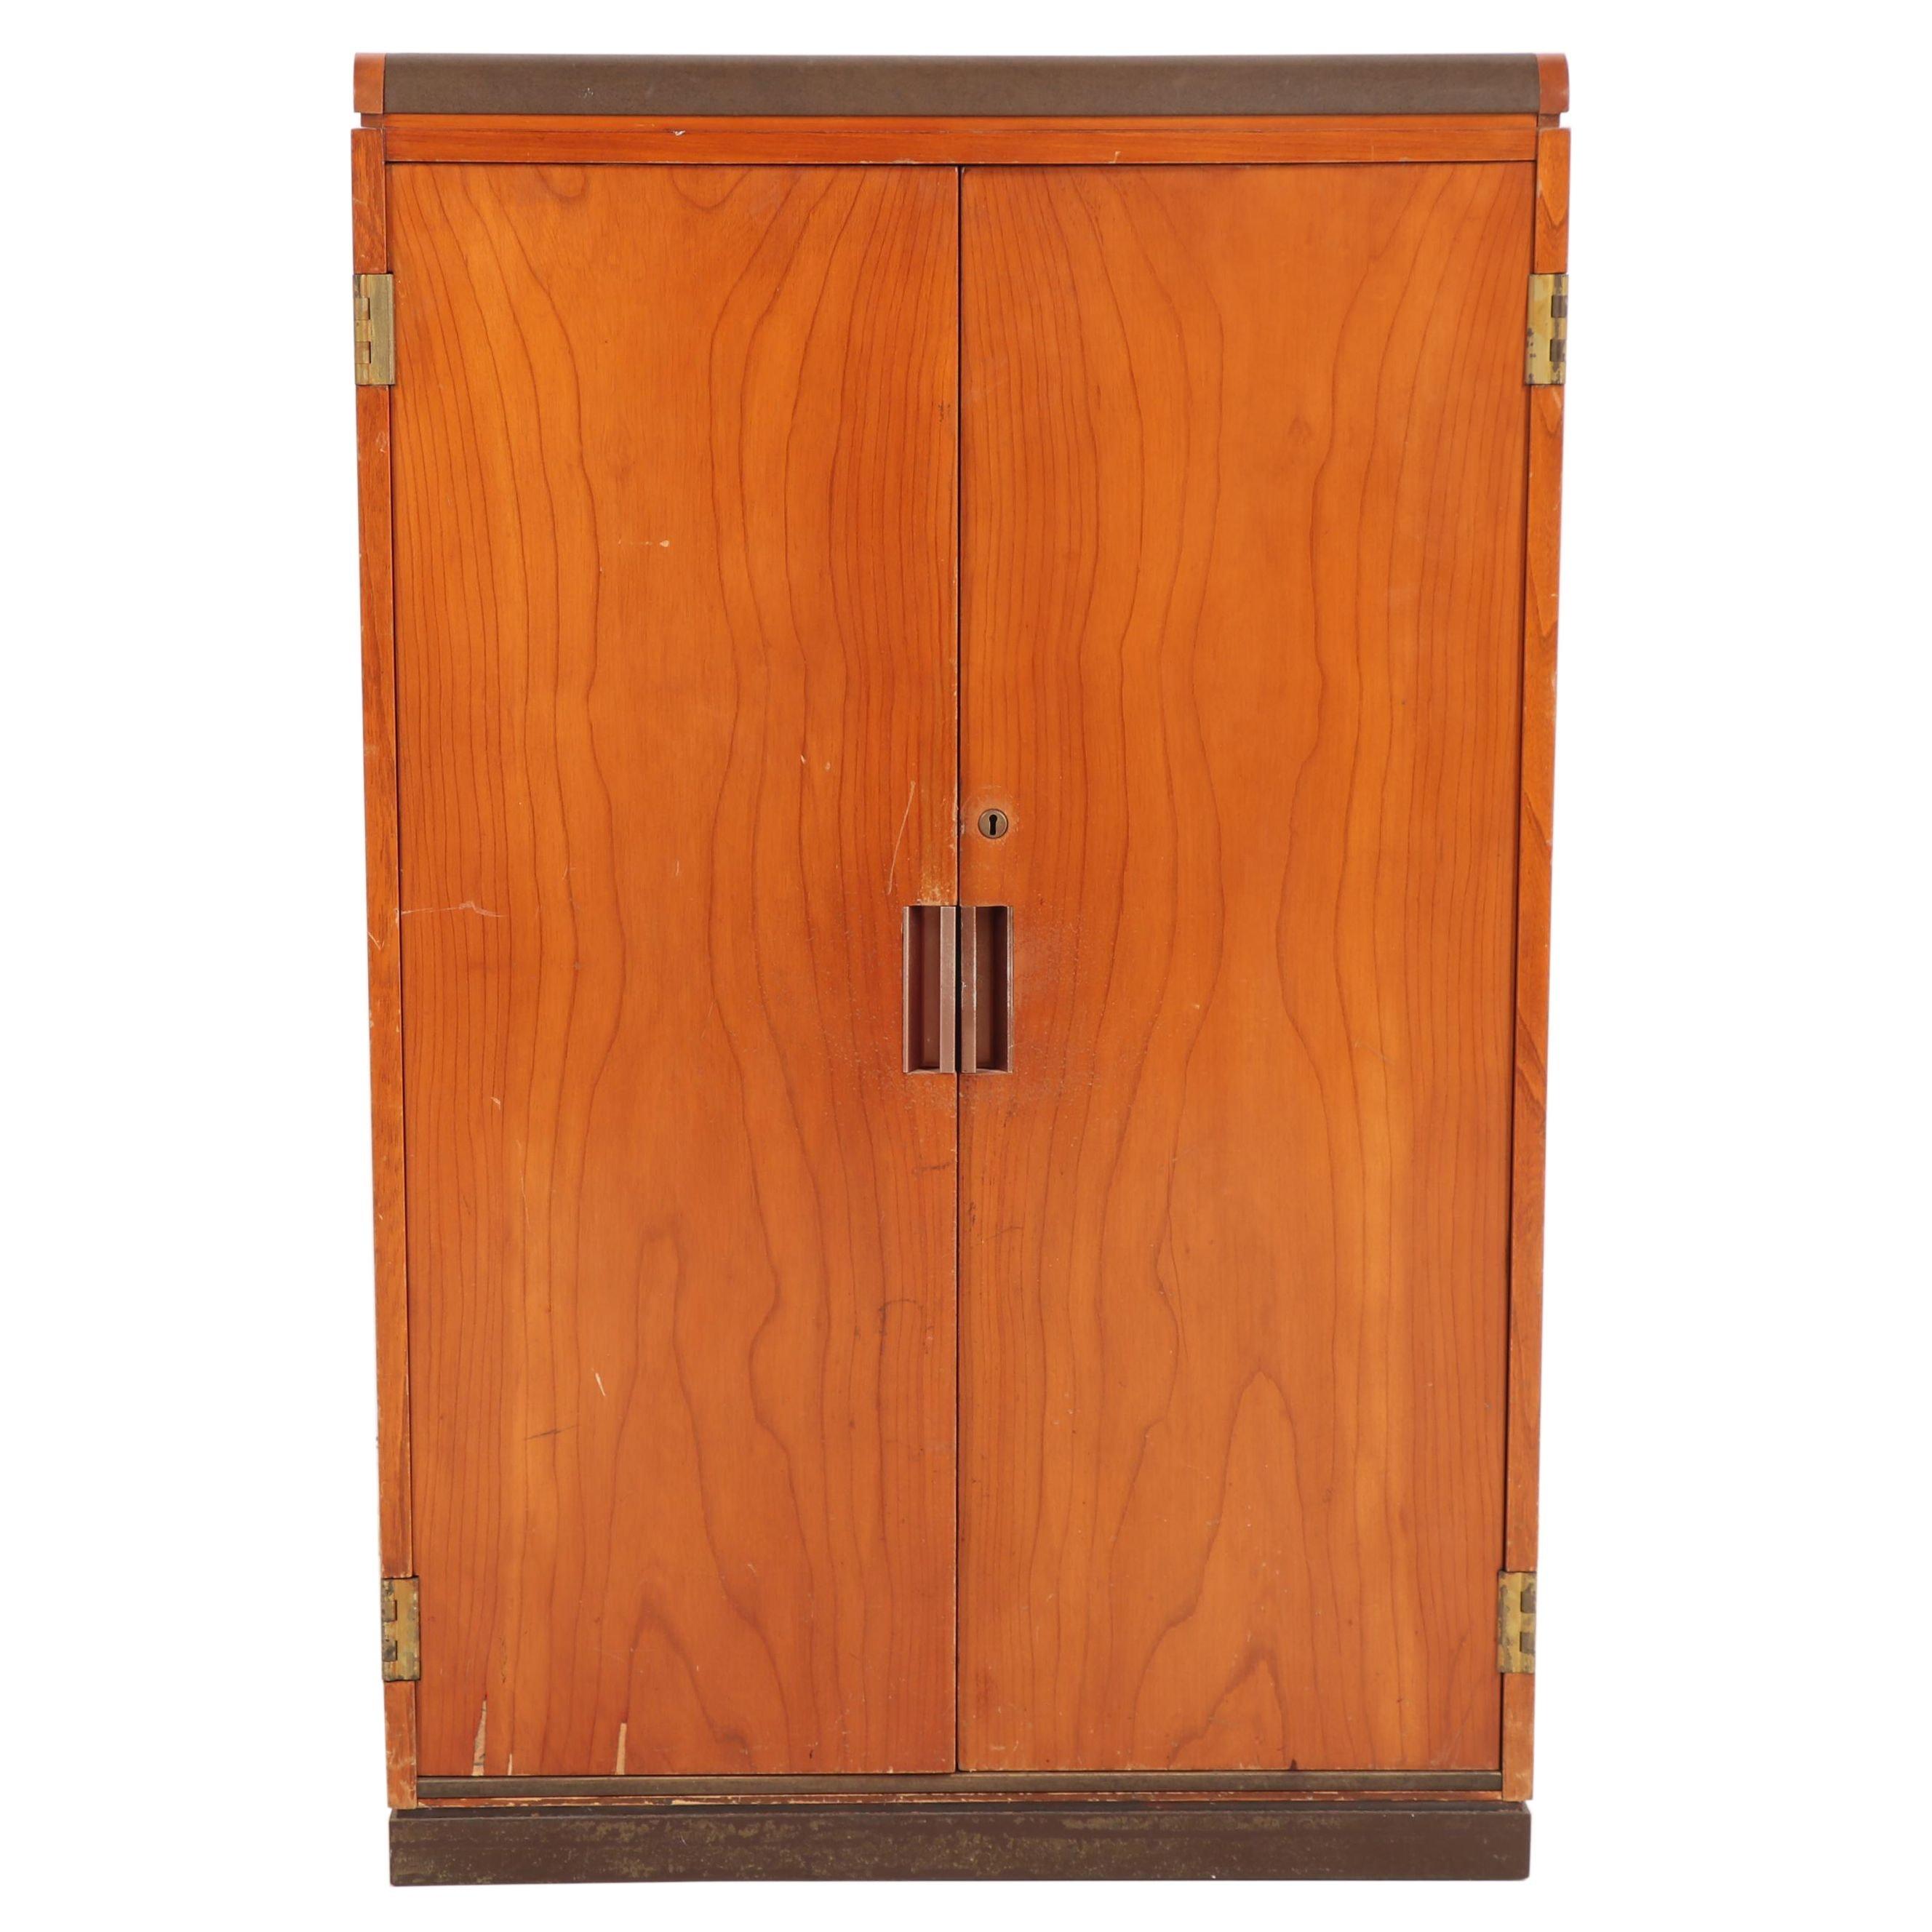 Teak Lockable Storage Cabinet, Mid-20th Century